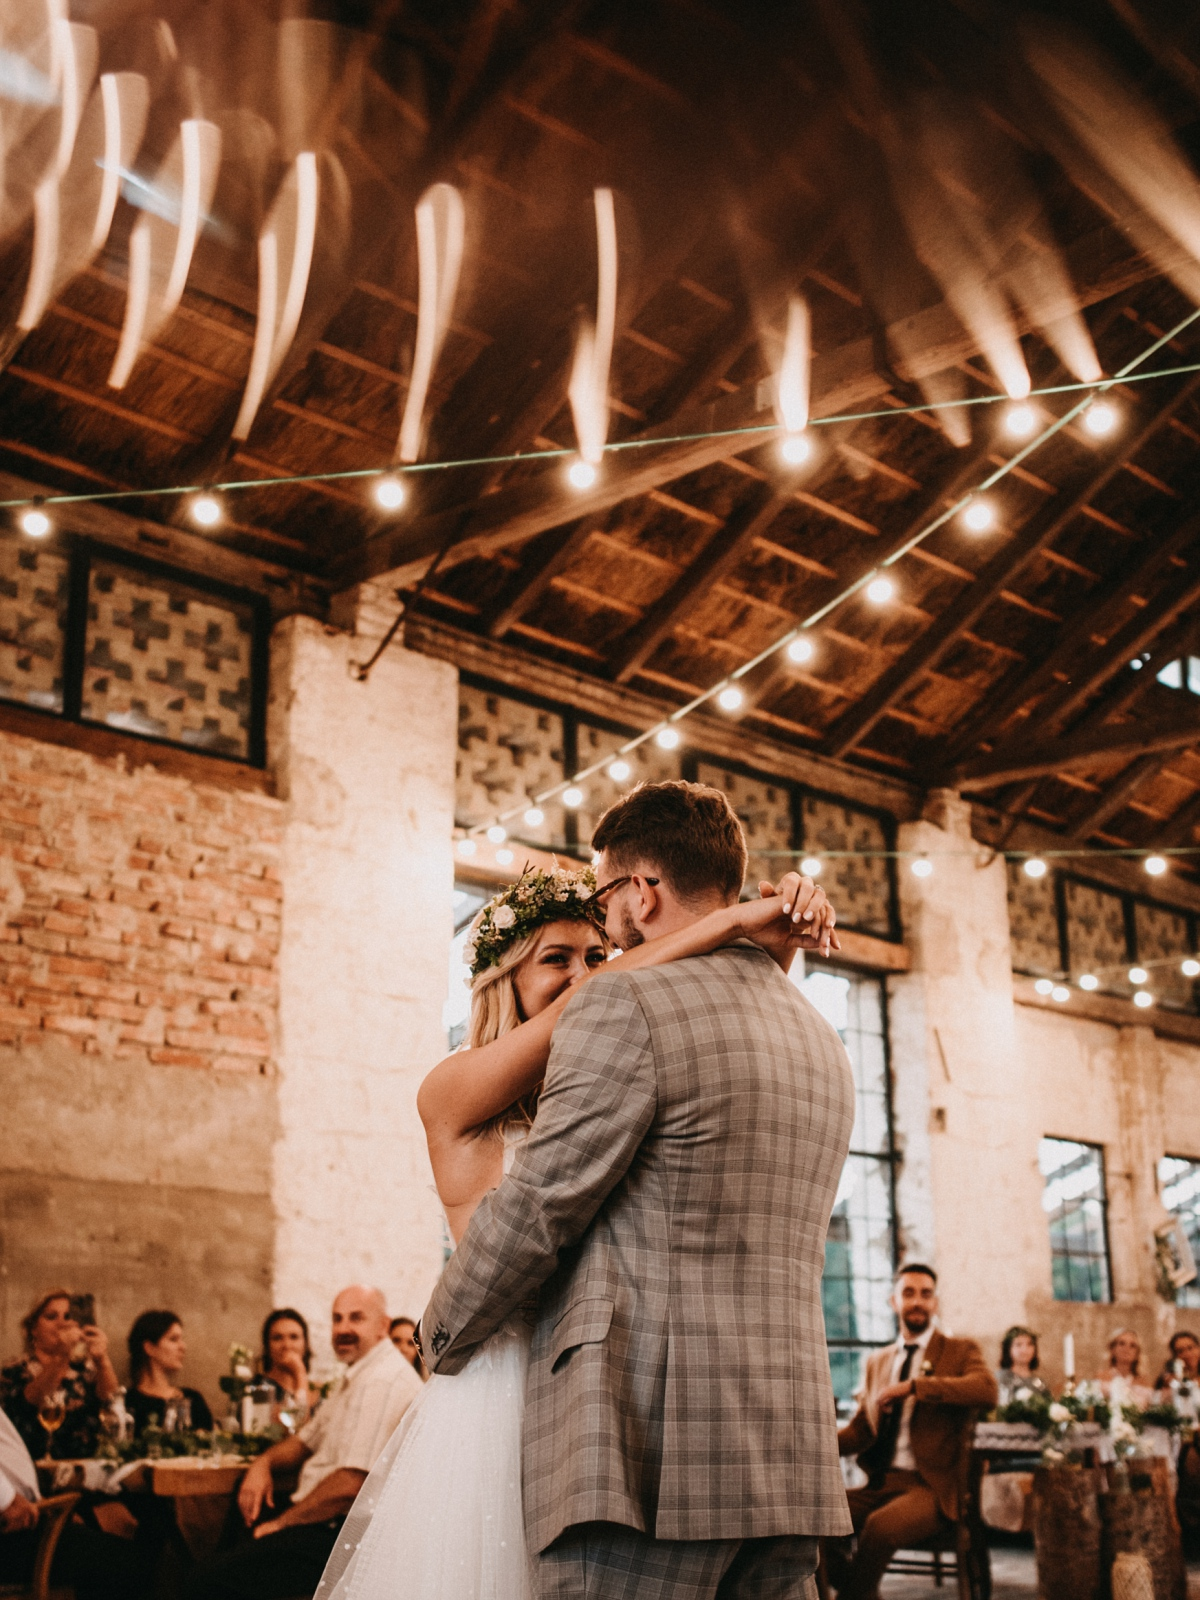 focení svatby stodola suška